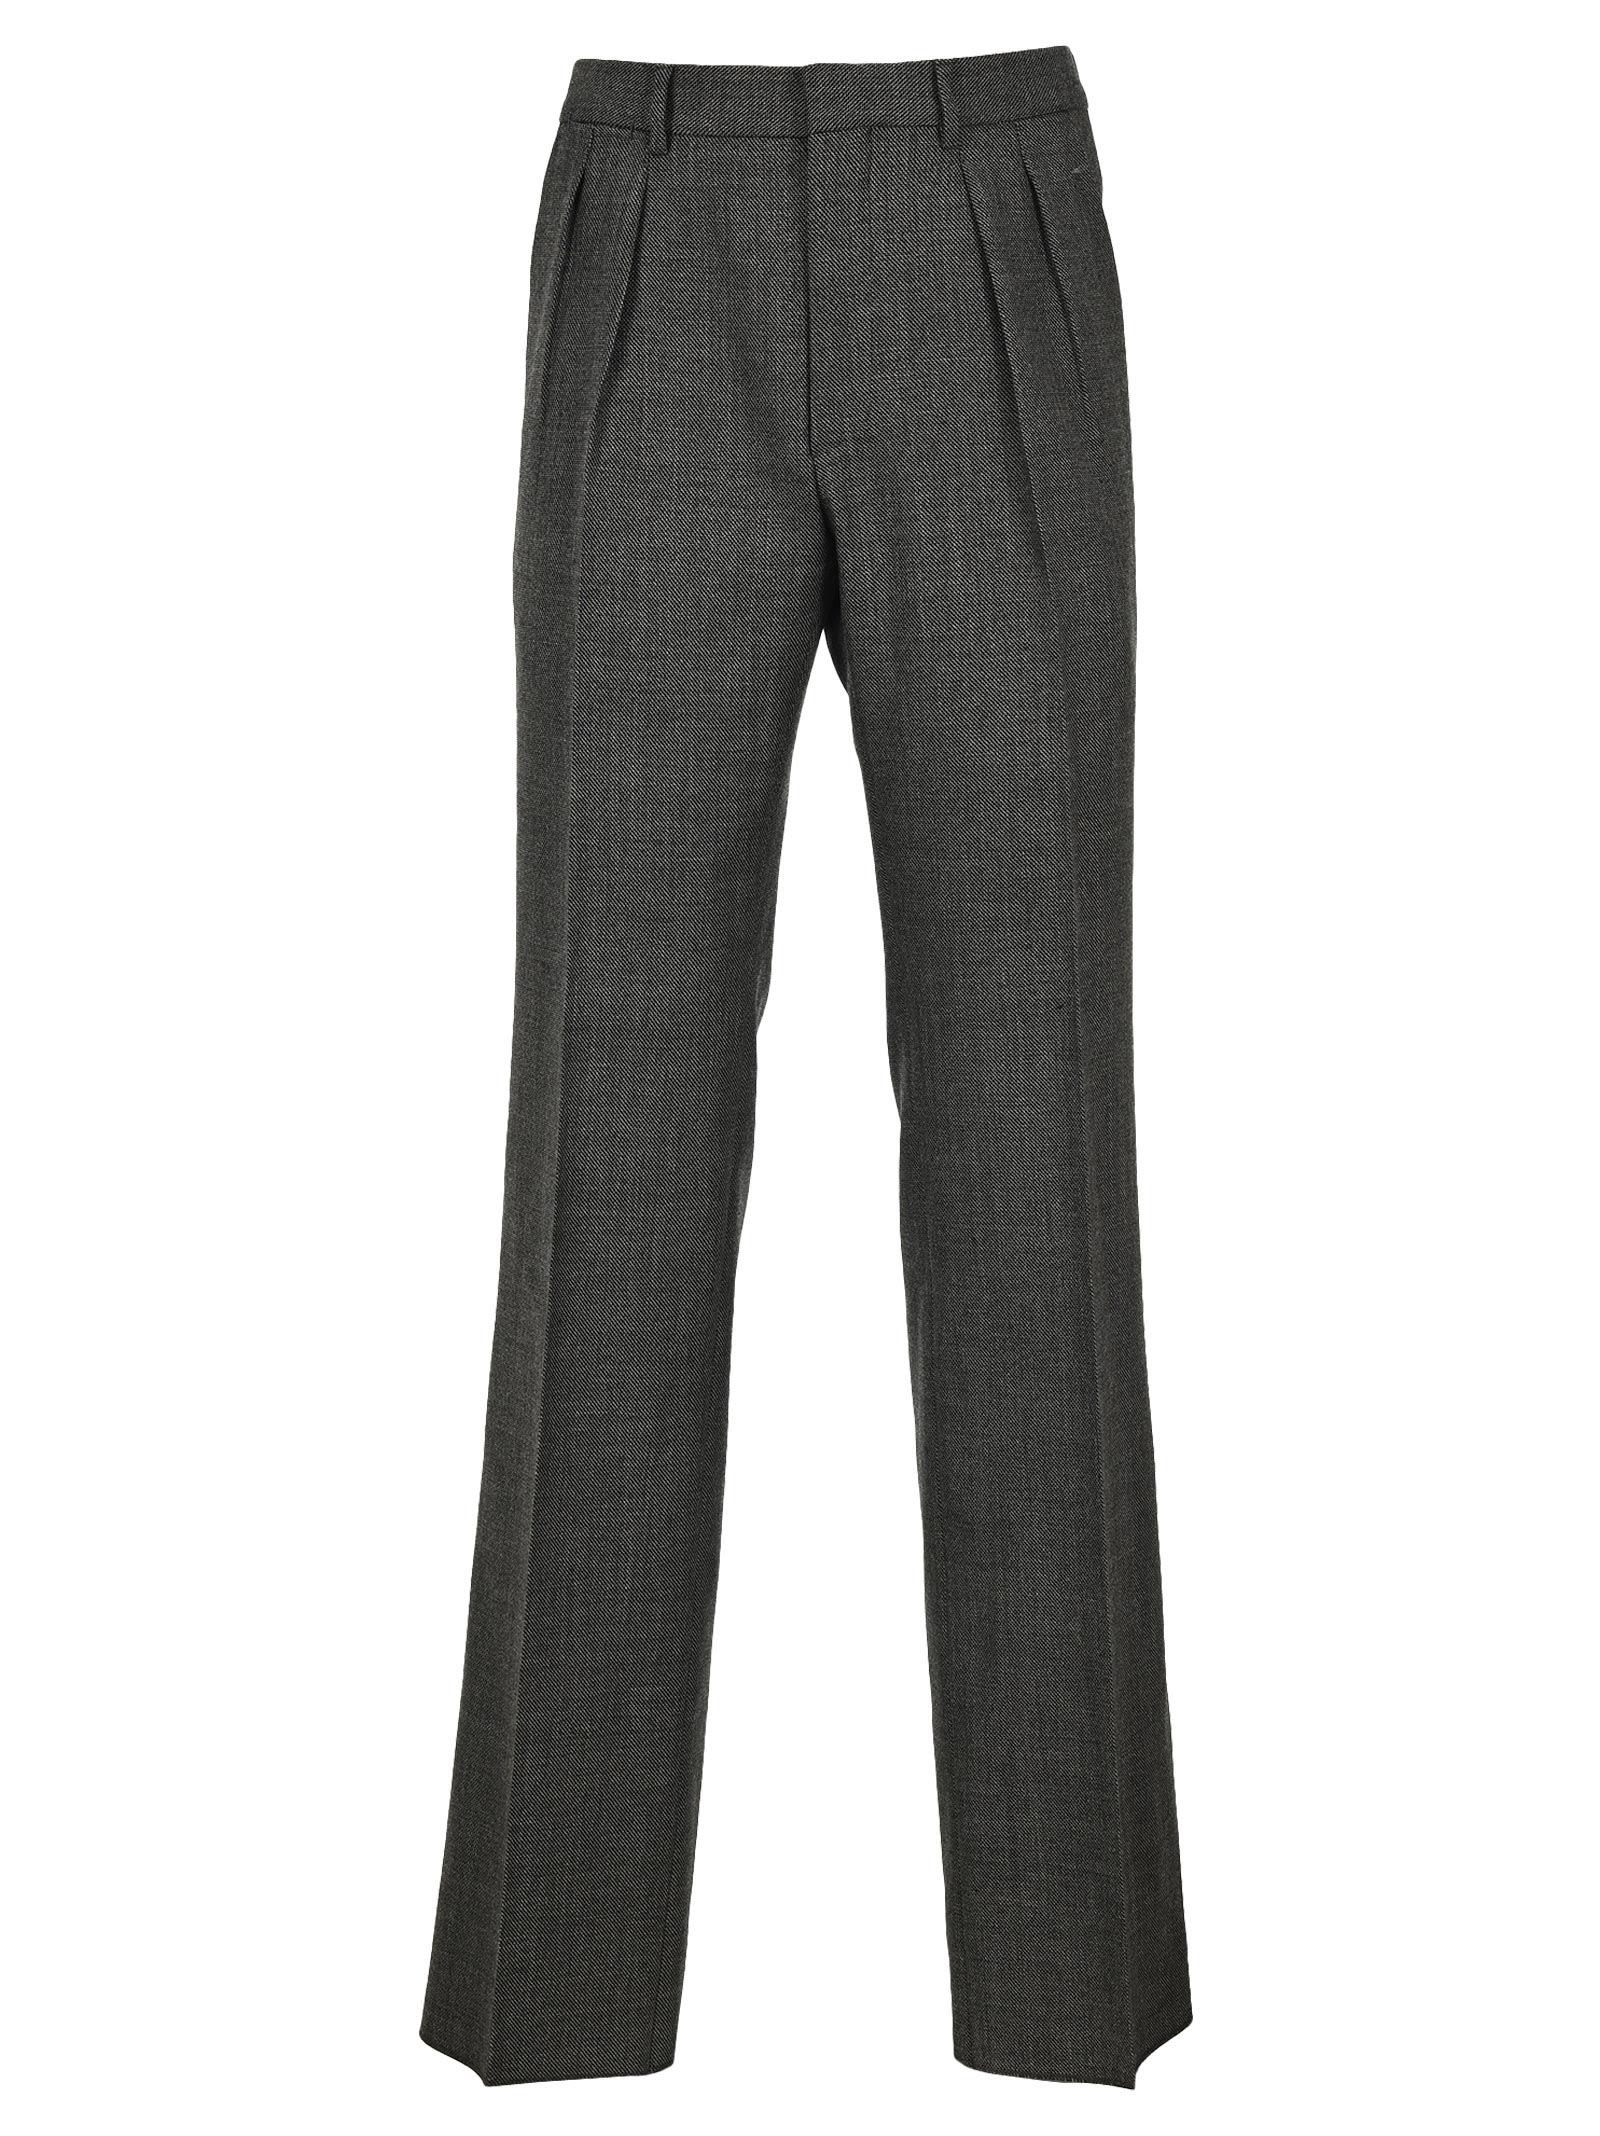 Tom Ford Straight Leg Pants